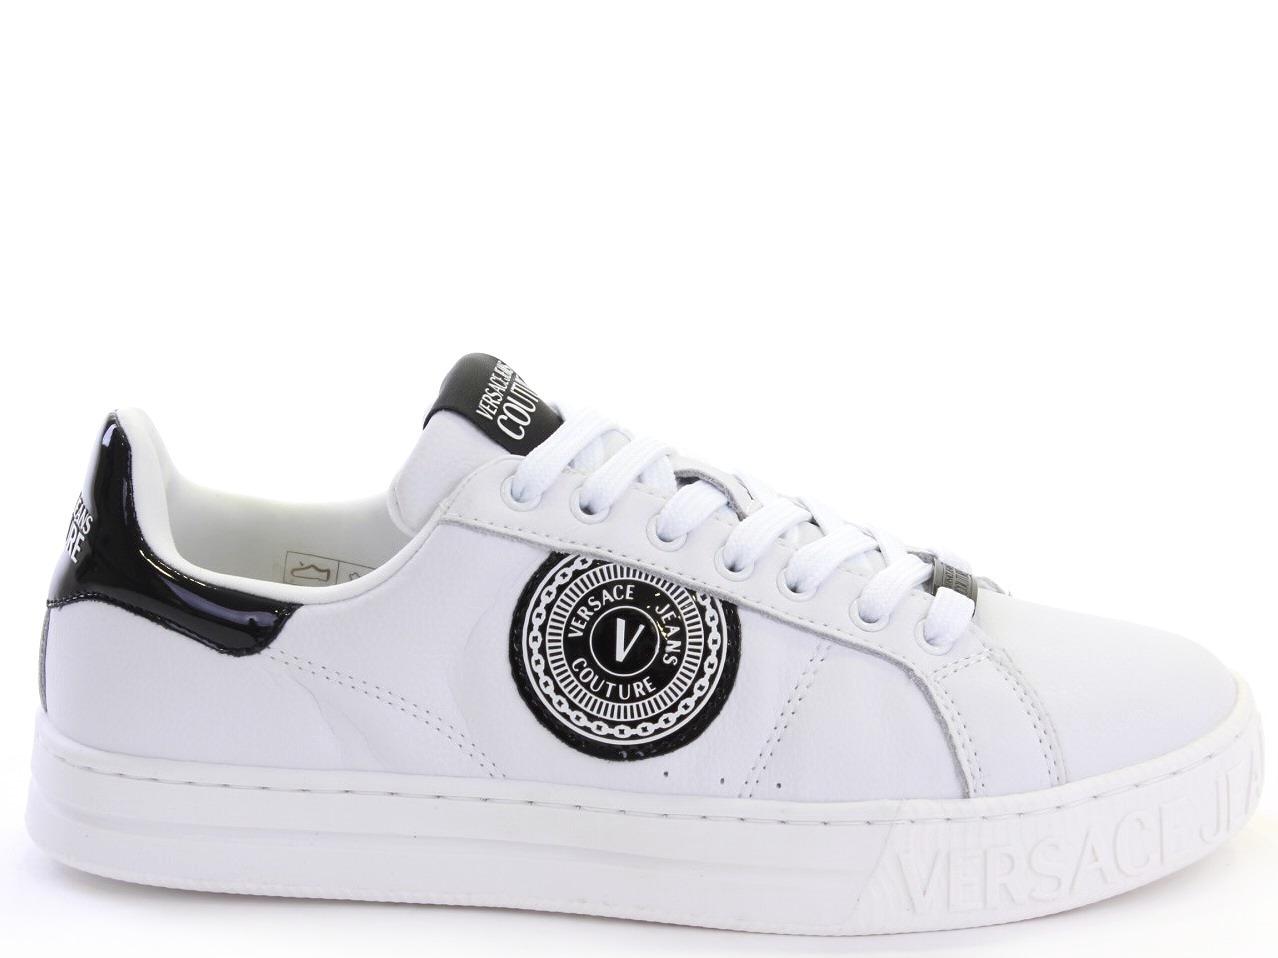 Sneakers, Espadrilles Versace Jeans - 652 71YA3SK1 ZP026